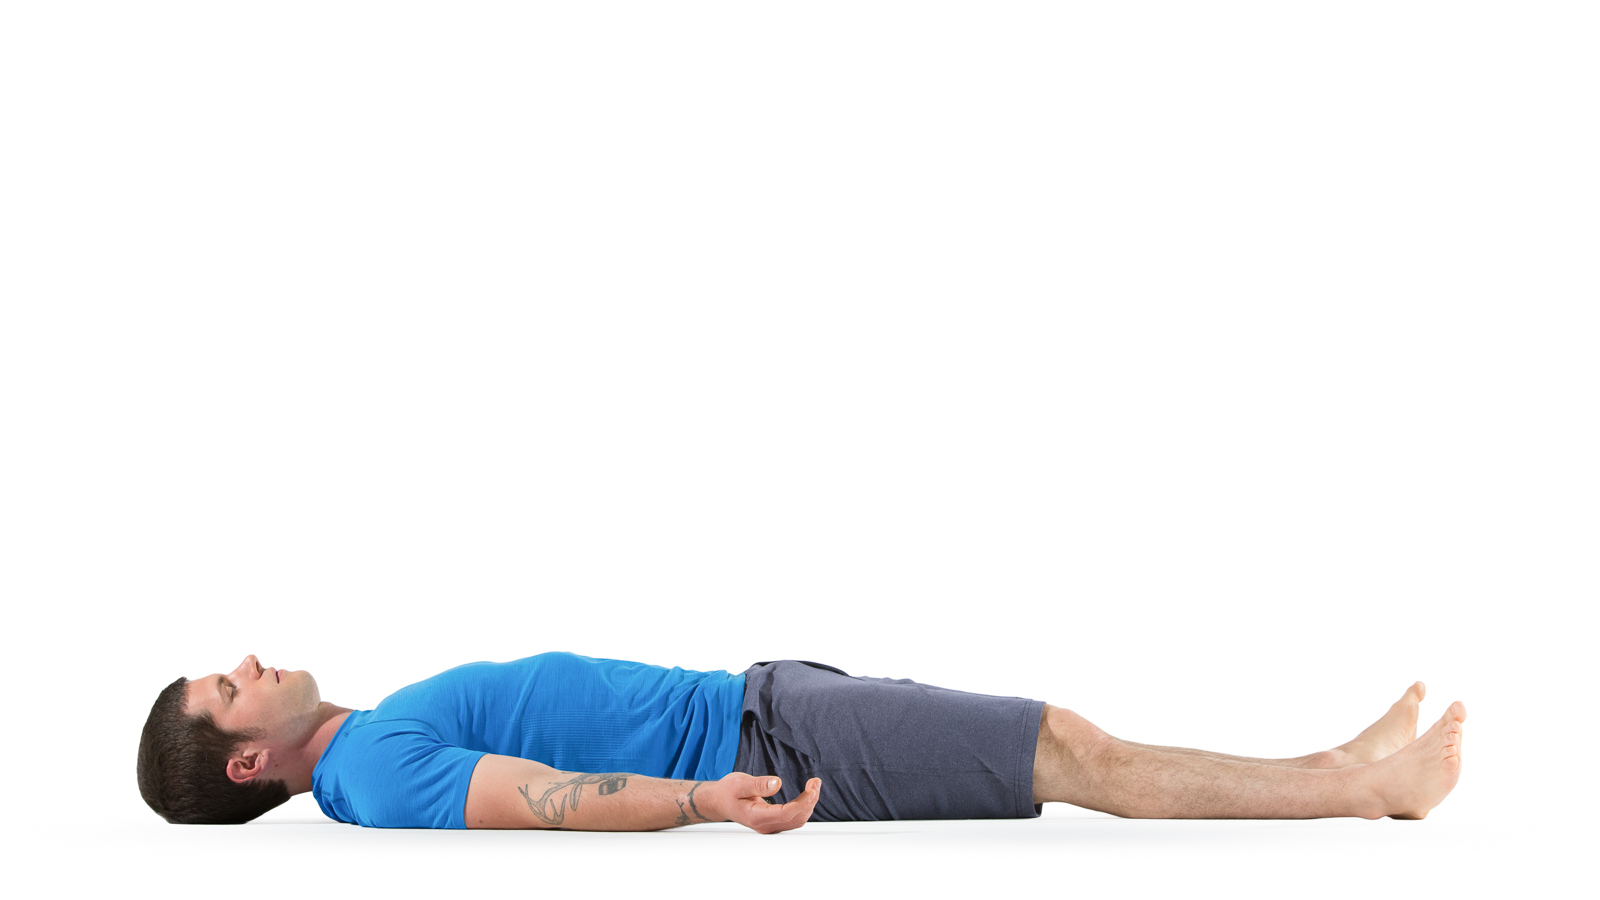 corpse pose yoga international